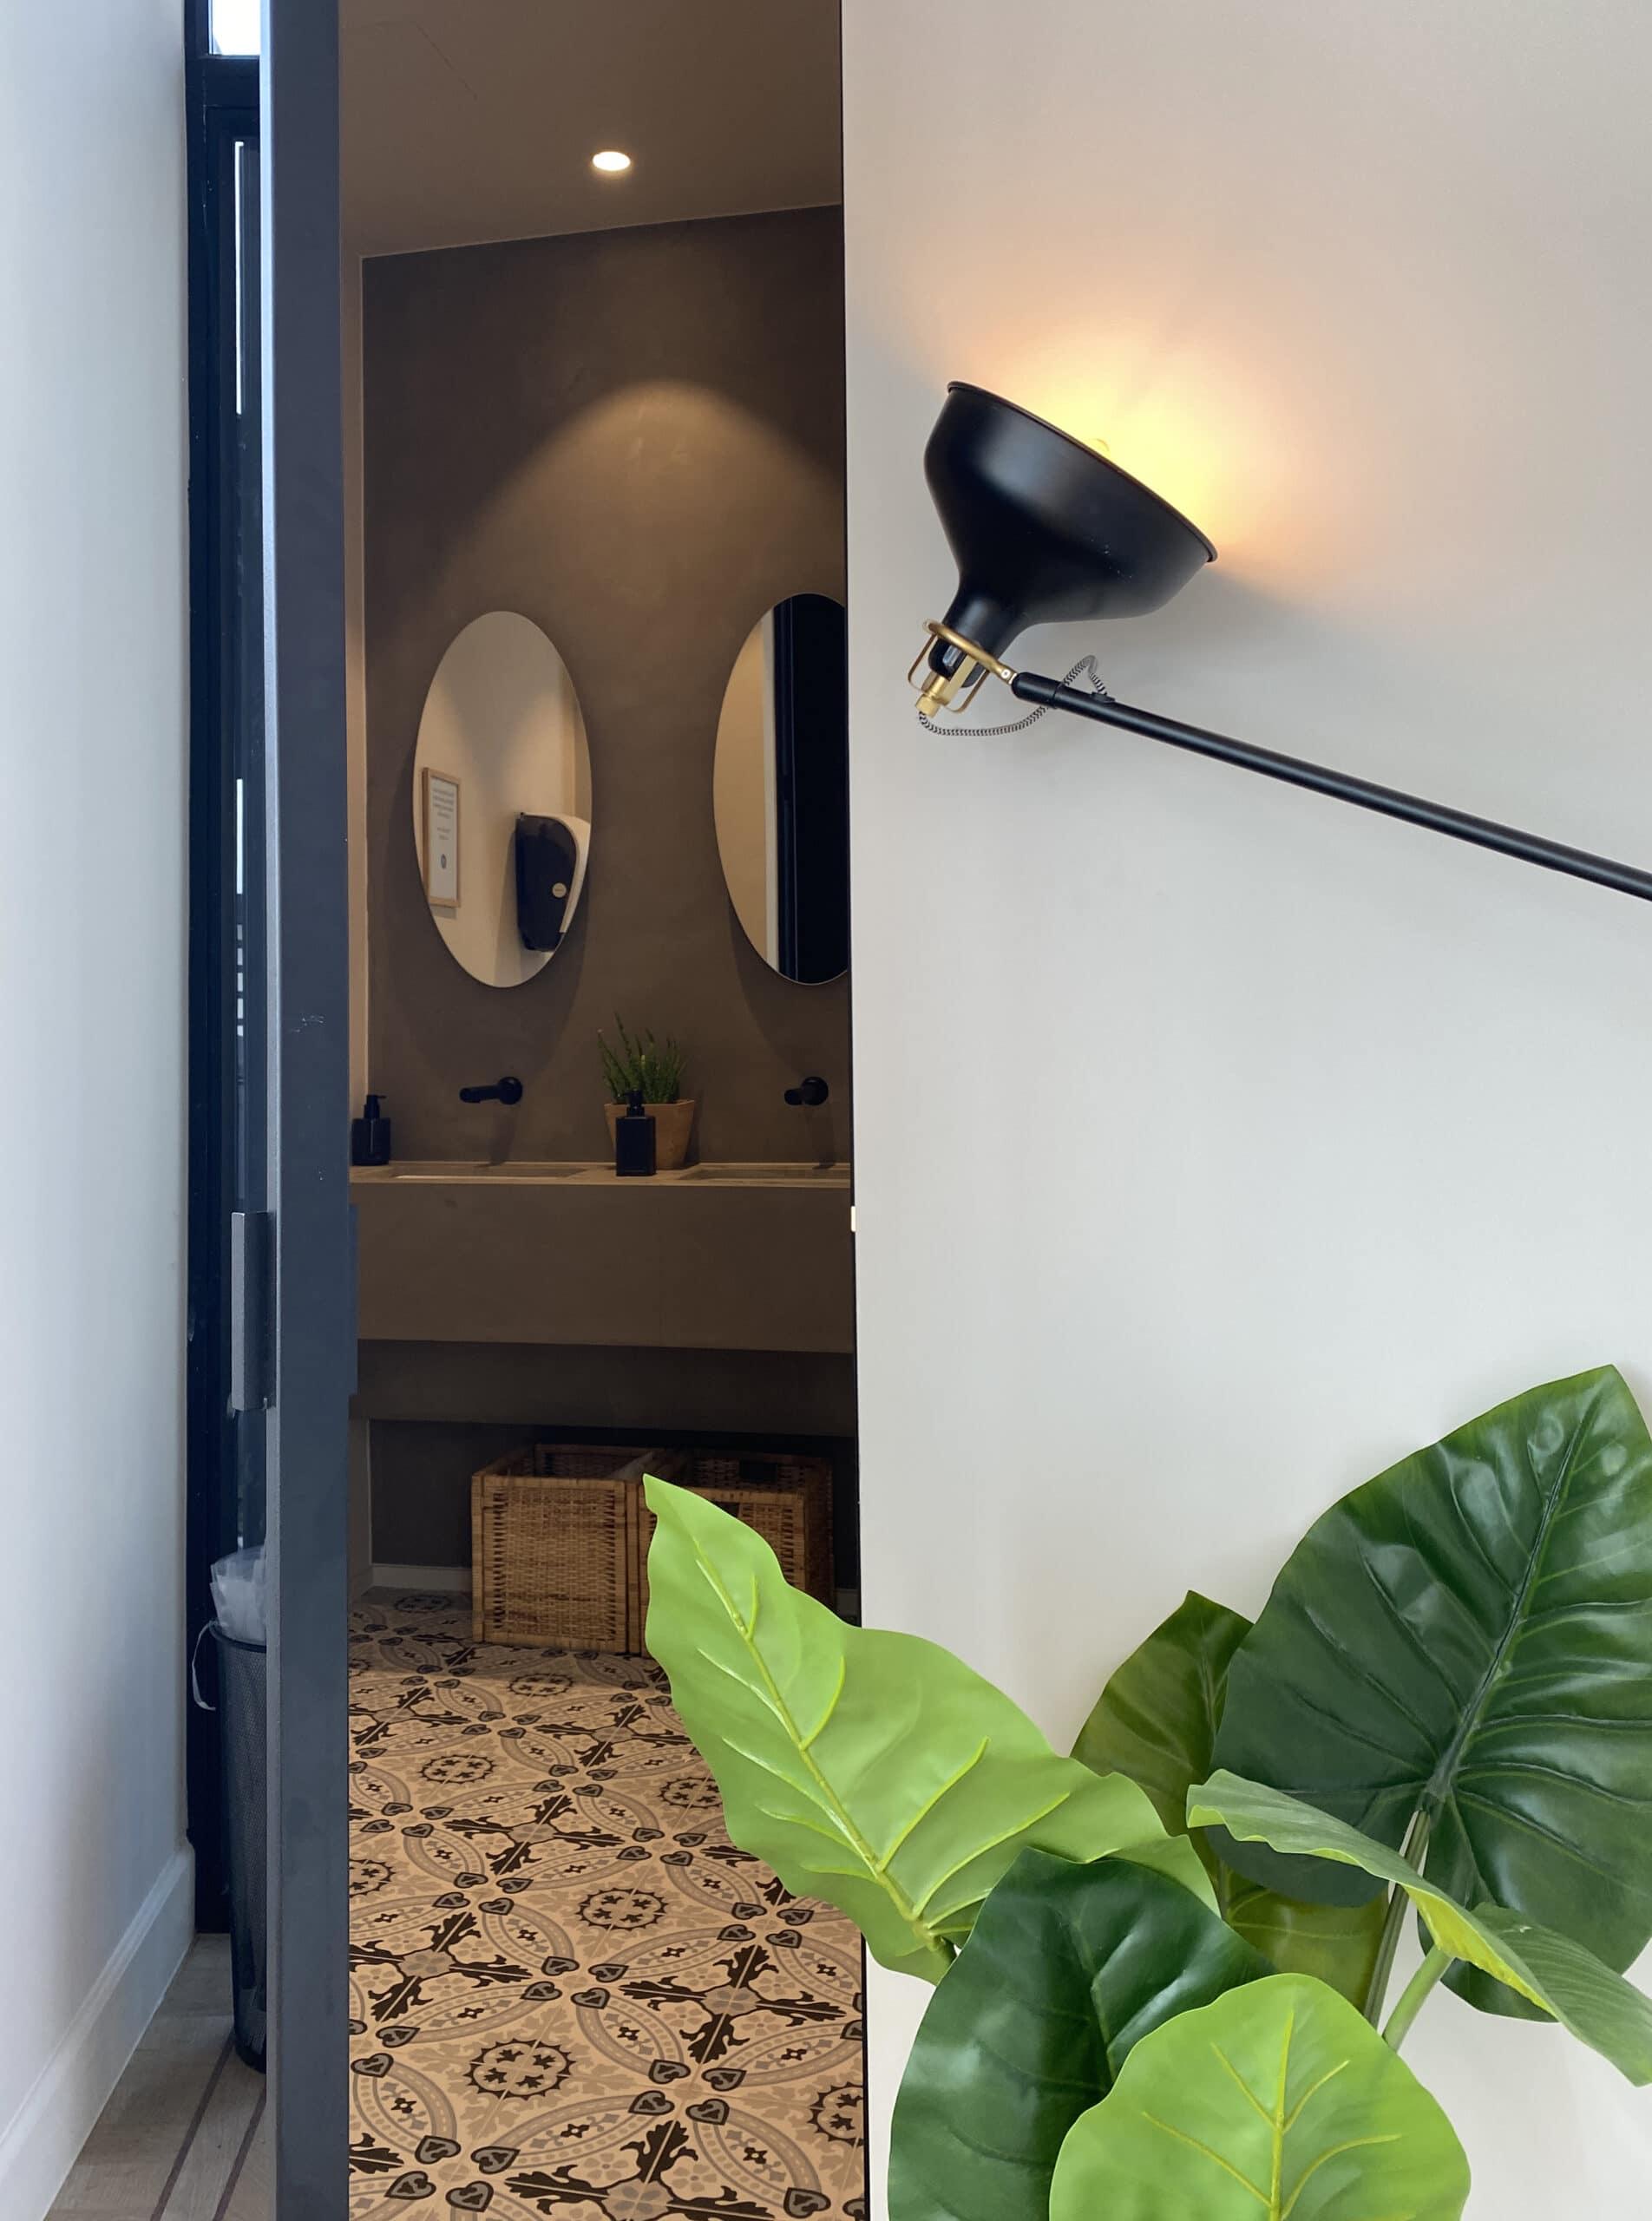 IMG 8186 2 scaled | Baeyens & Beck architecten Gent | architect nieuwbouw renovatie interieur | high end | architectenbureau